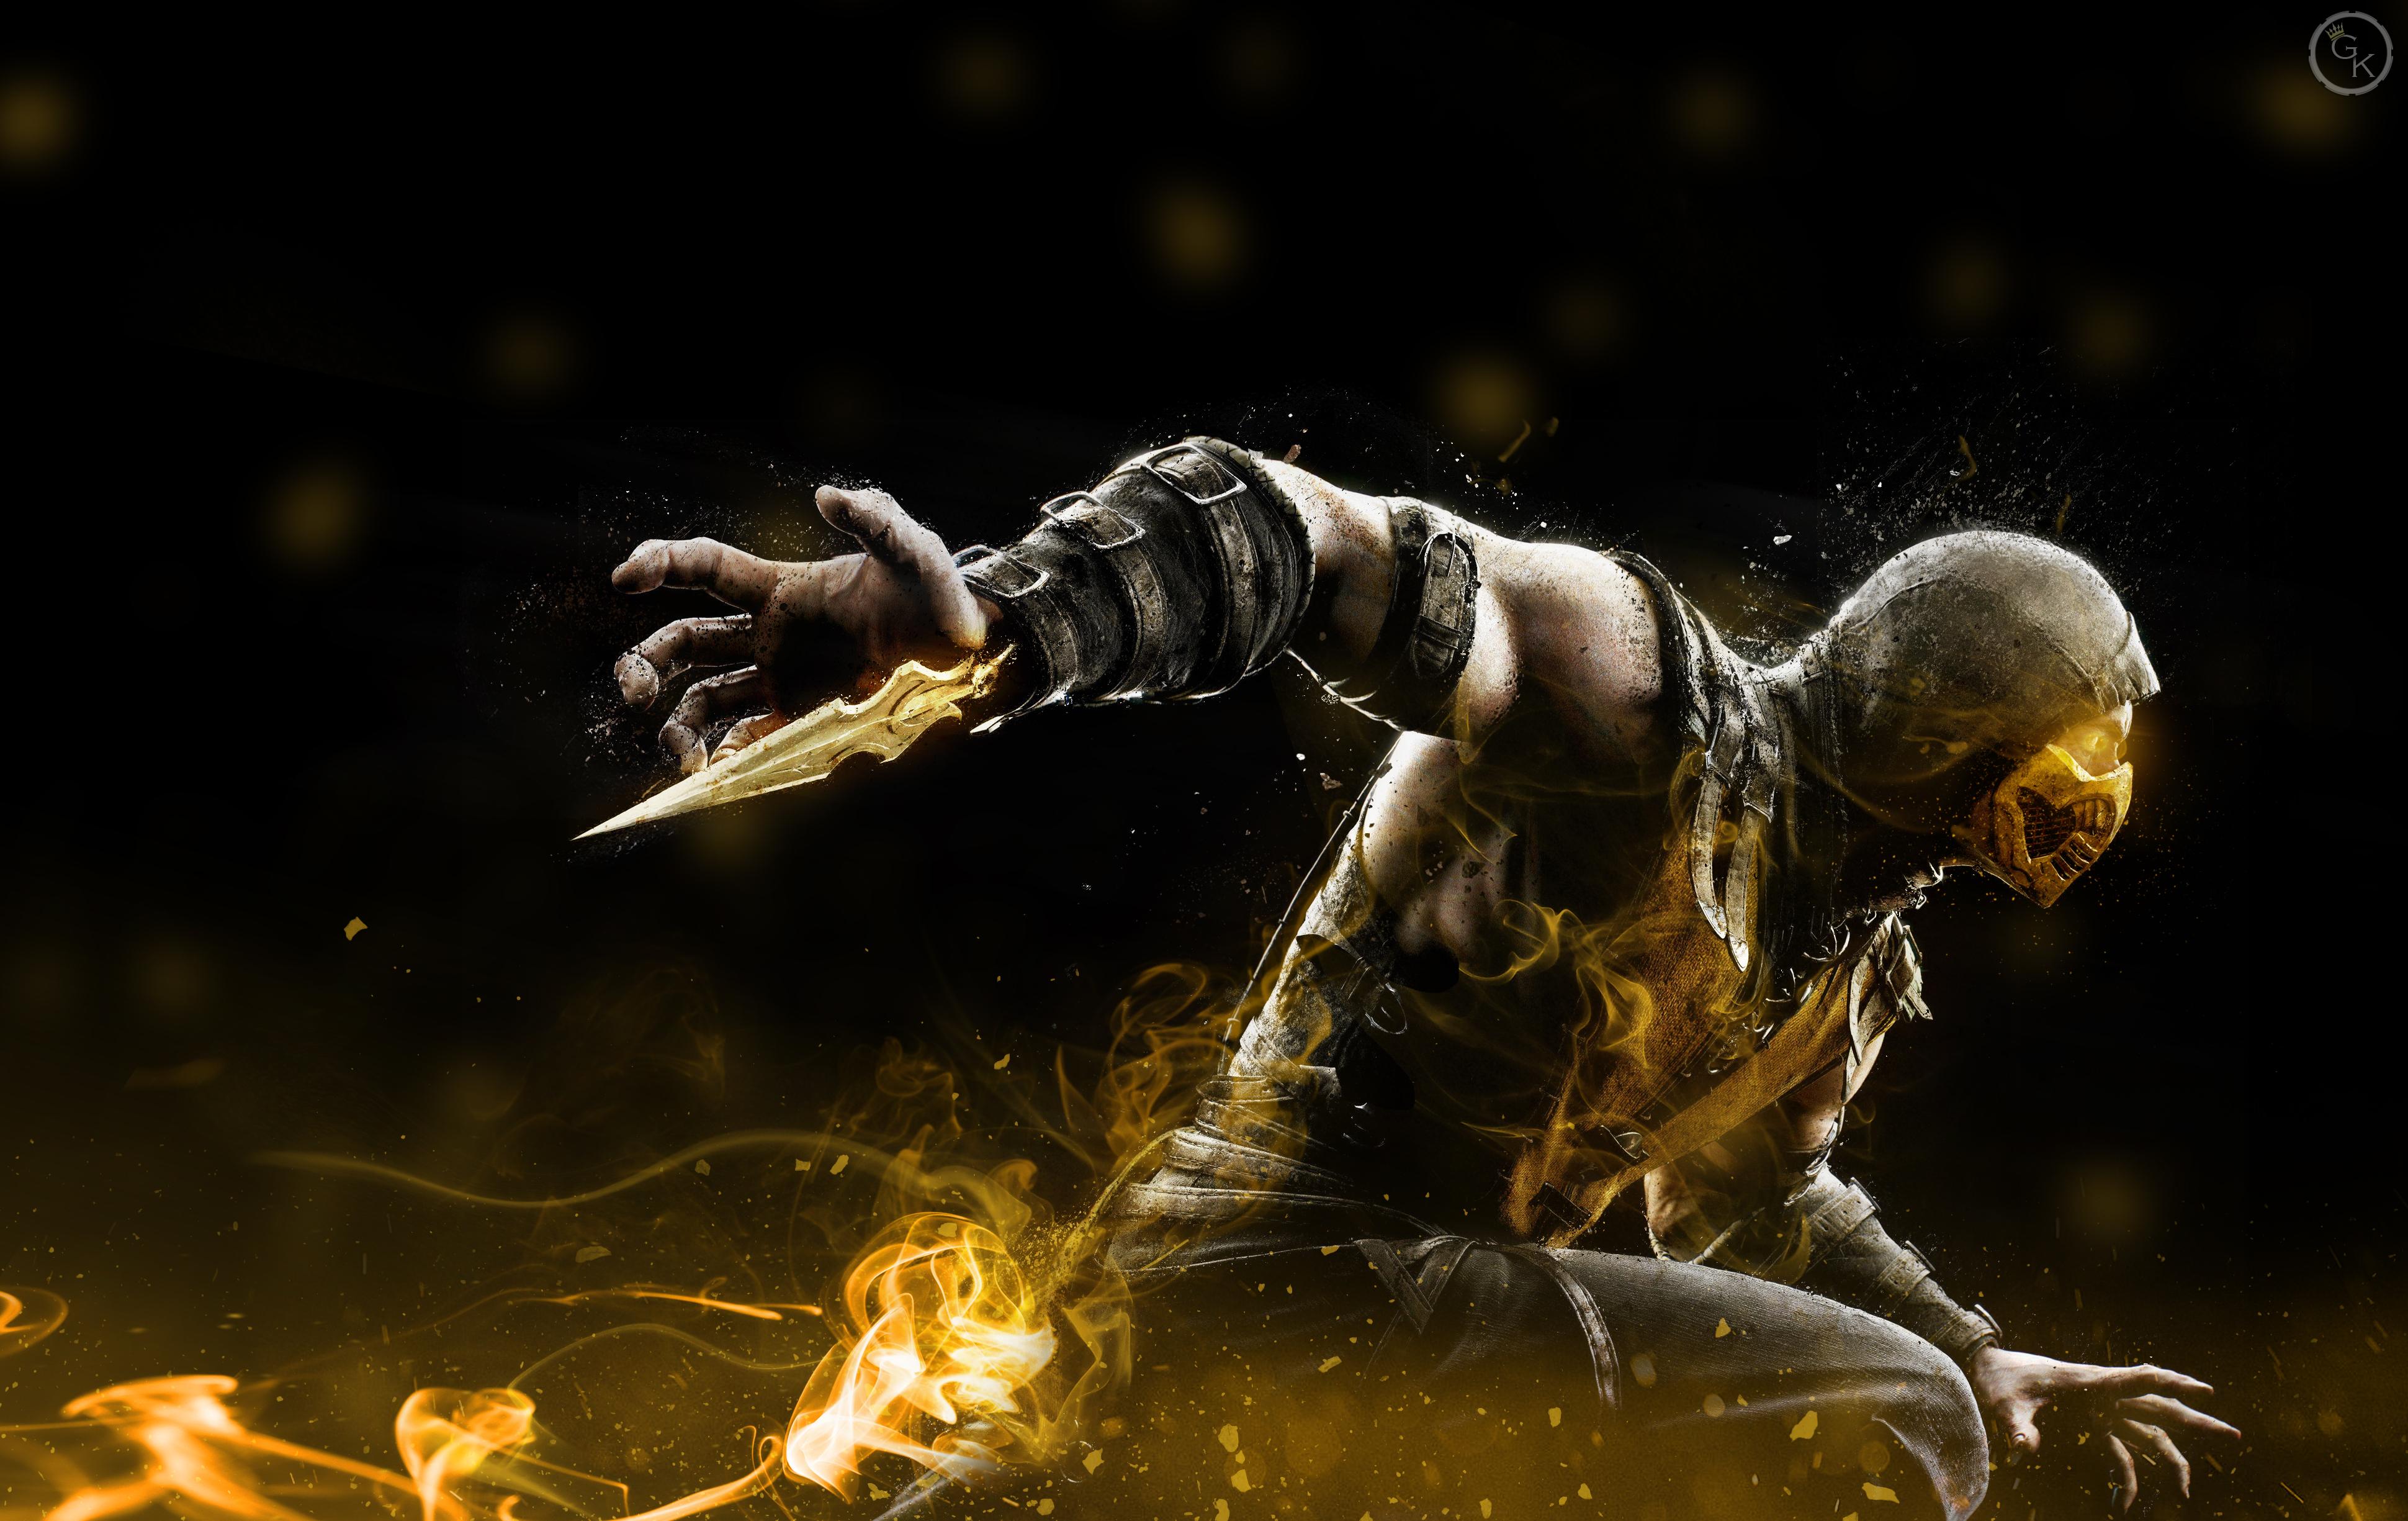 Mortal Kombat X Scorpion By General K1mb0 On Deviantart